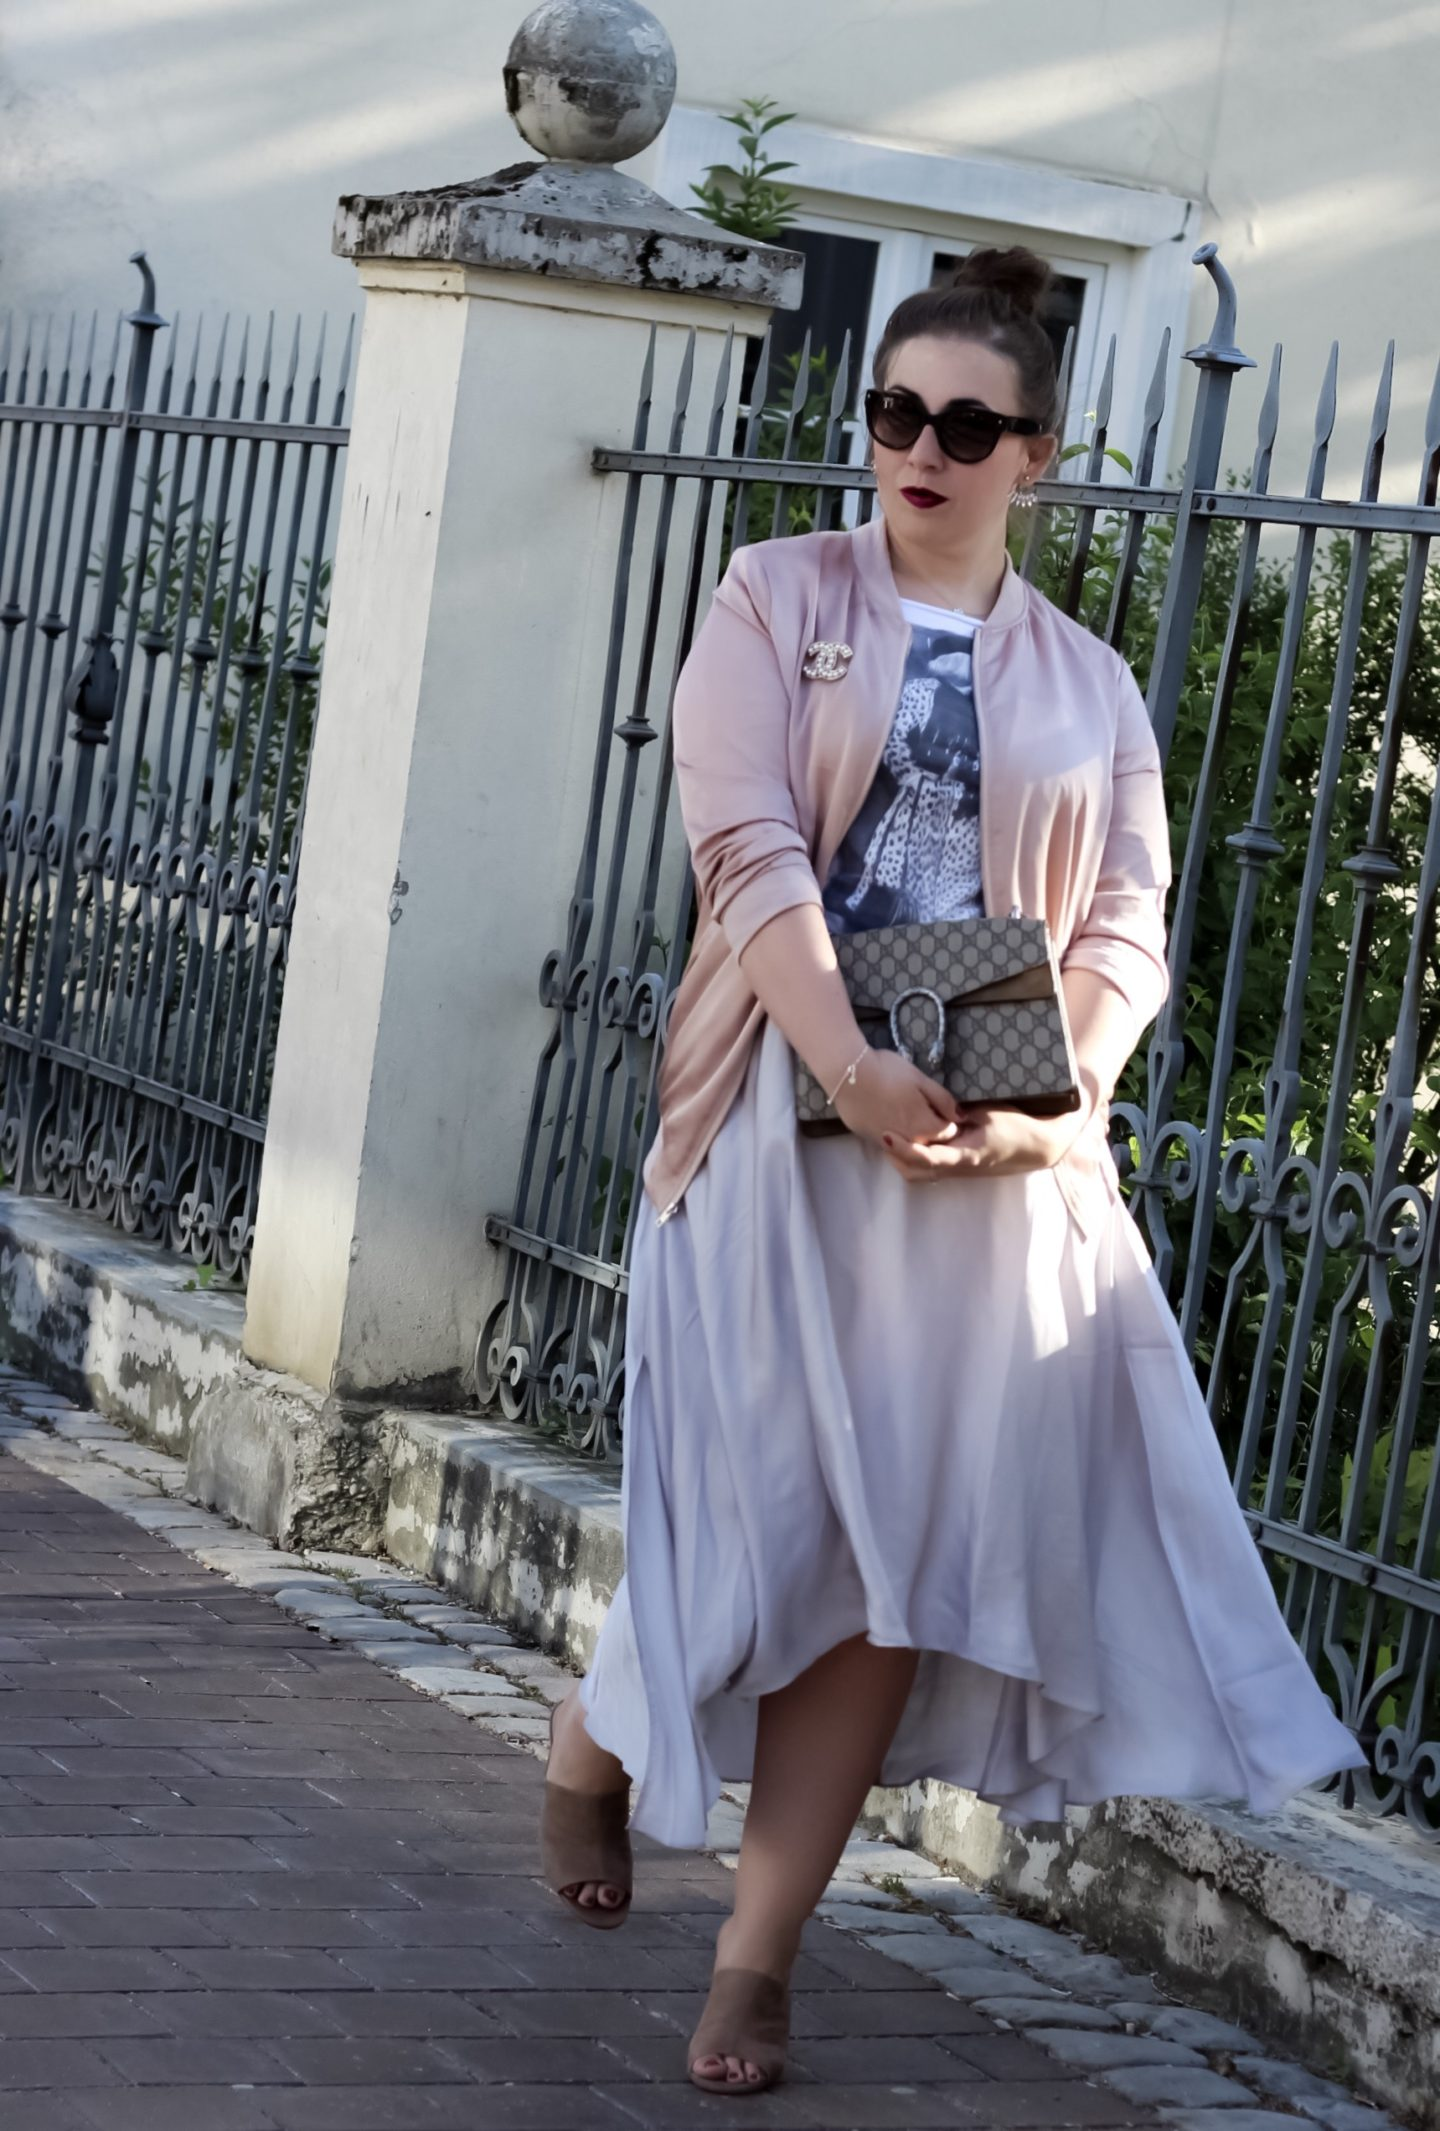 Rosa-Satin-Bomberjacke-Satinrock-Fashionblogger-ZARA-Plexiglas-Sandaletten-Gucci-Dionysus-Satinrock-Susanne-Heidebach-Outfit-Curvyblogger-Details-Miss-Suzie-Loves-Inspiration-Midirockå